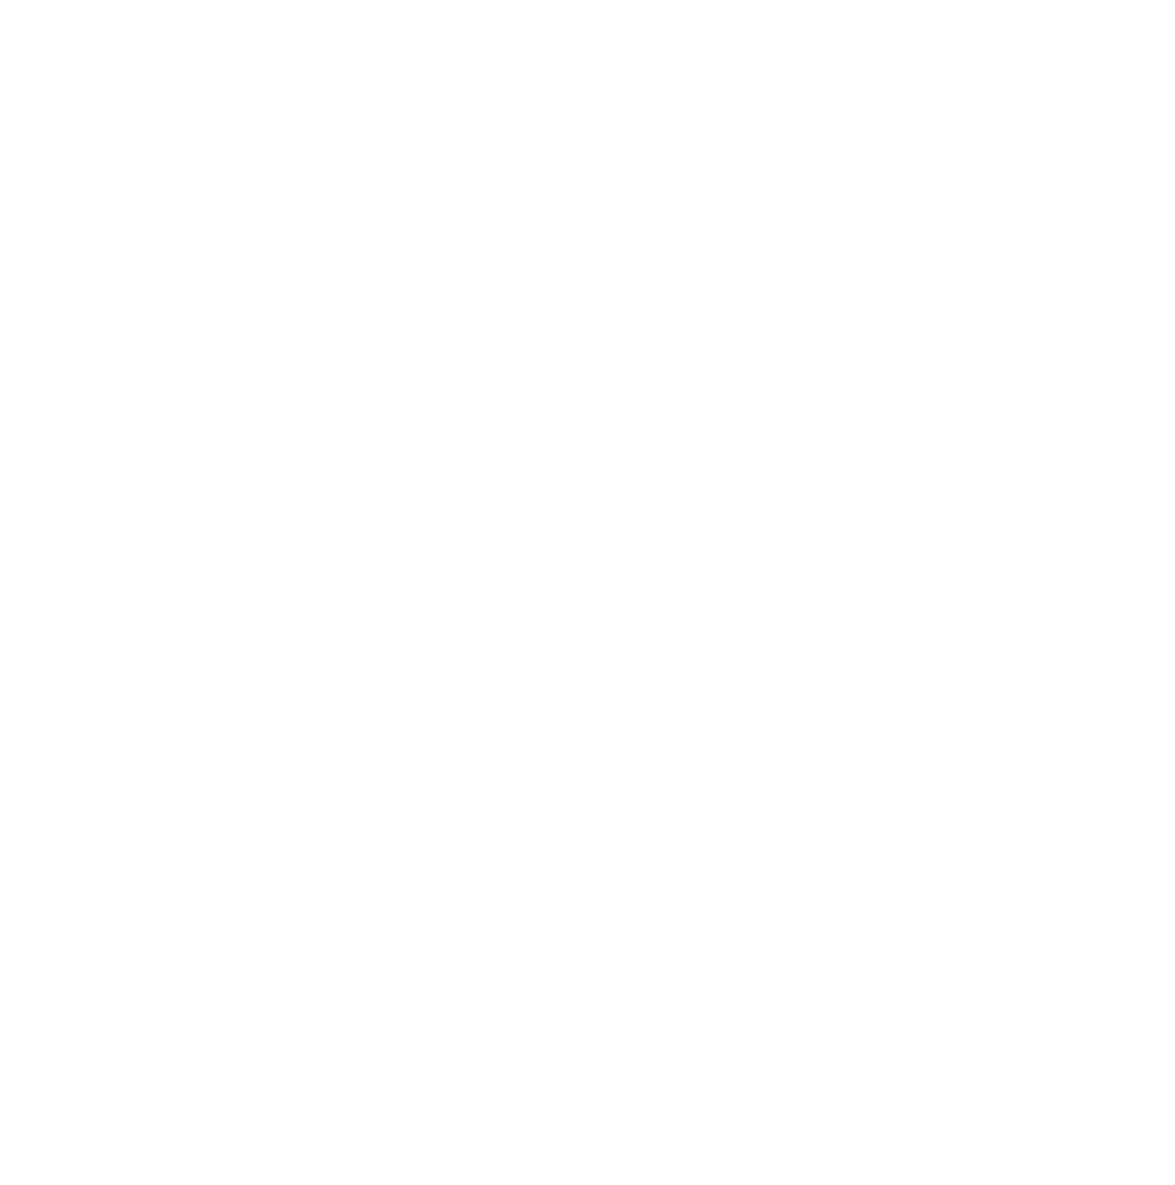 Referenz Emil Frey